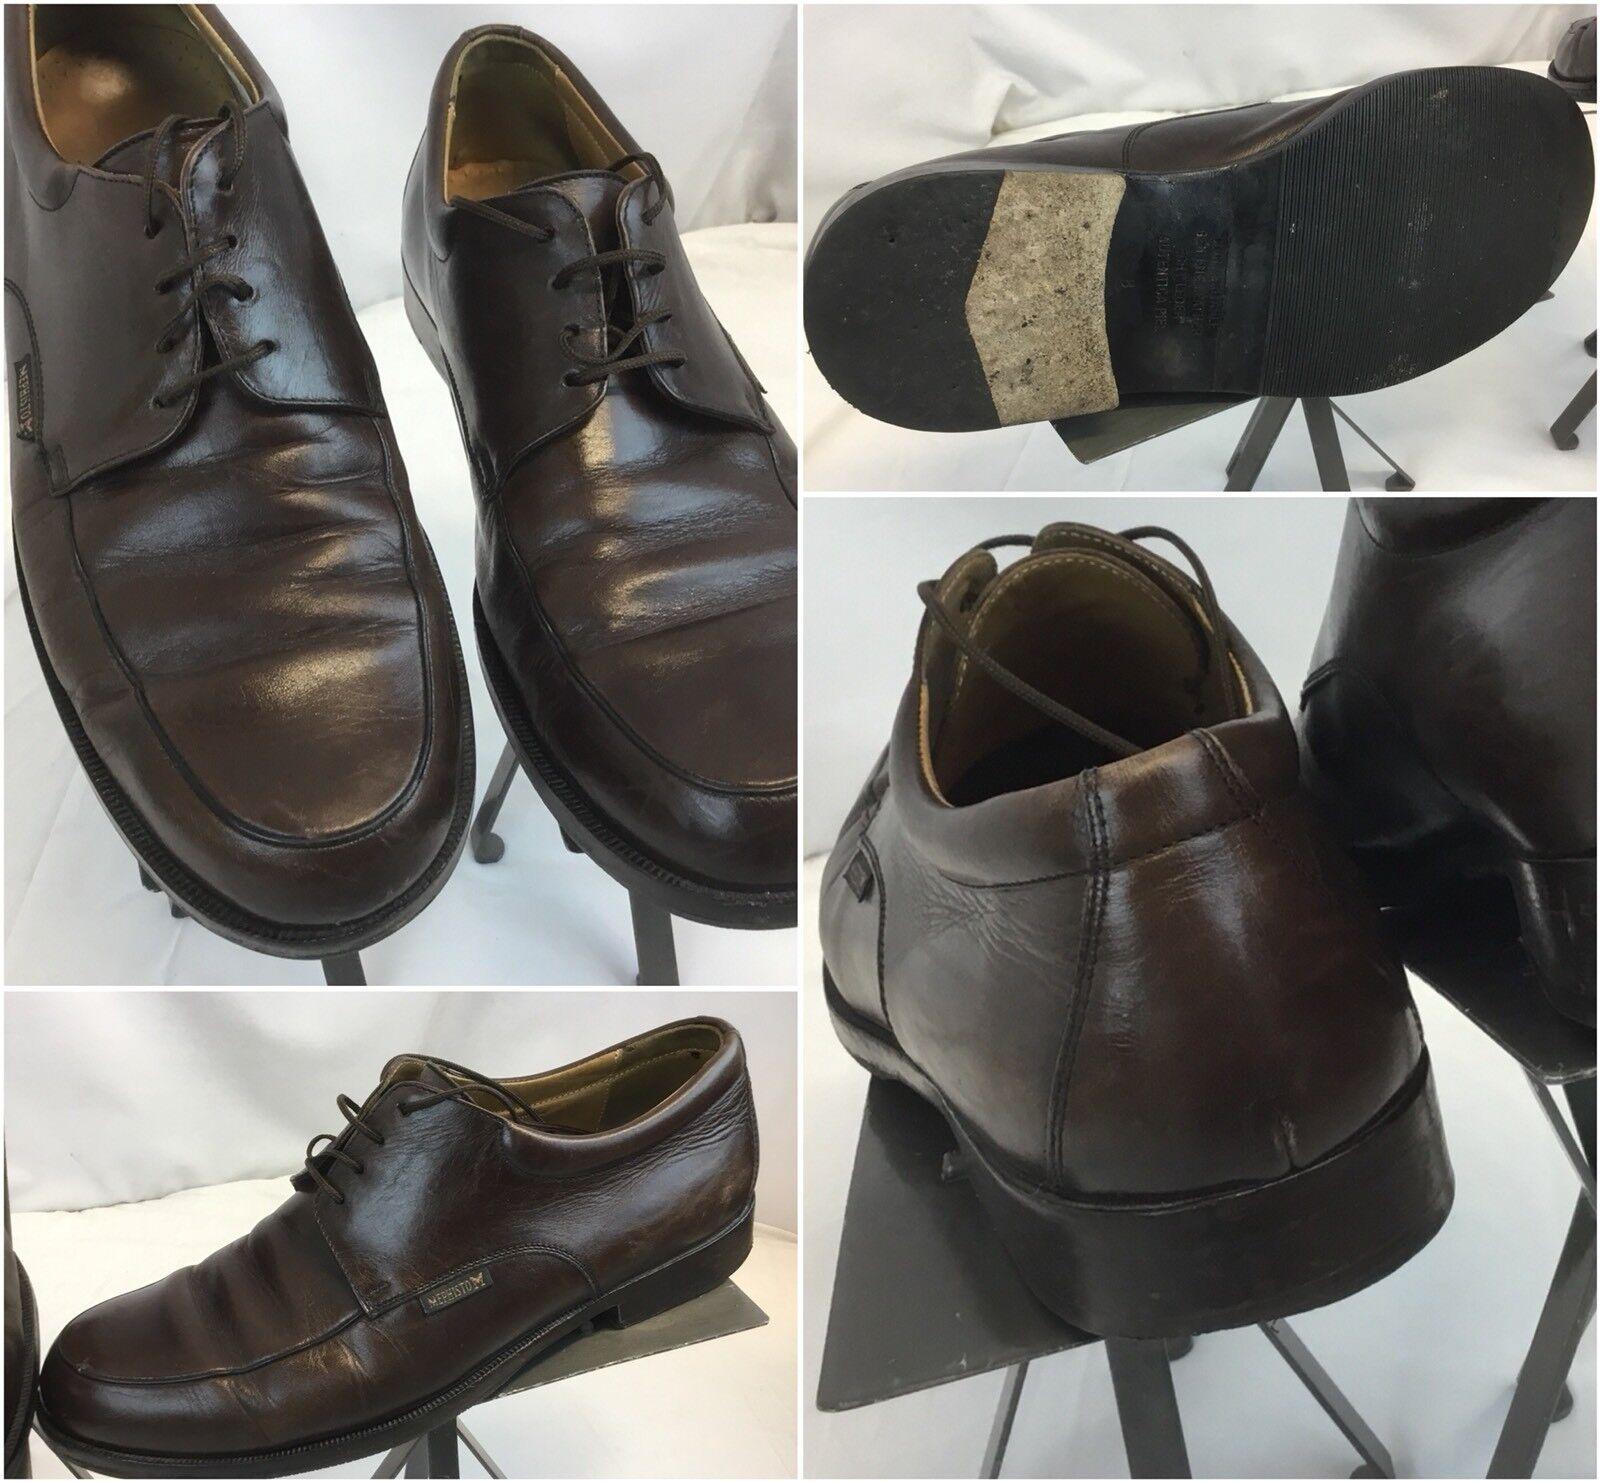 Scarpe casual da uomo Mephisto Oxford Shoes Sz 8 Brown Lace Leather Made In Portugal EUC YGI G8